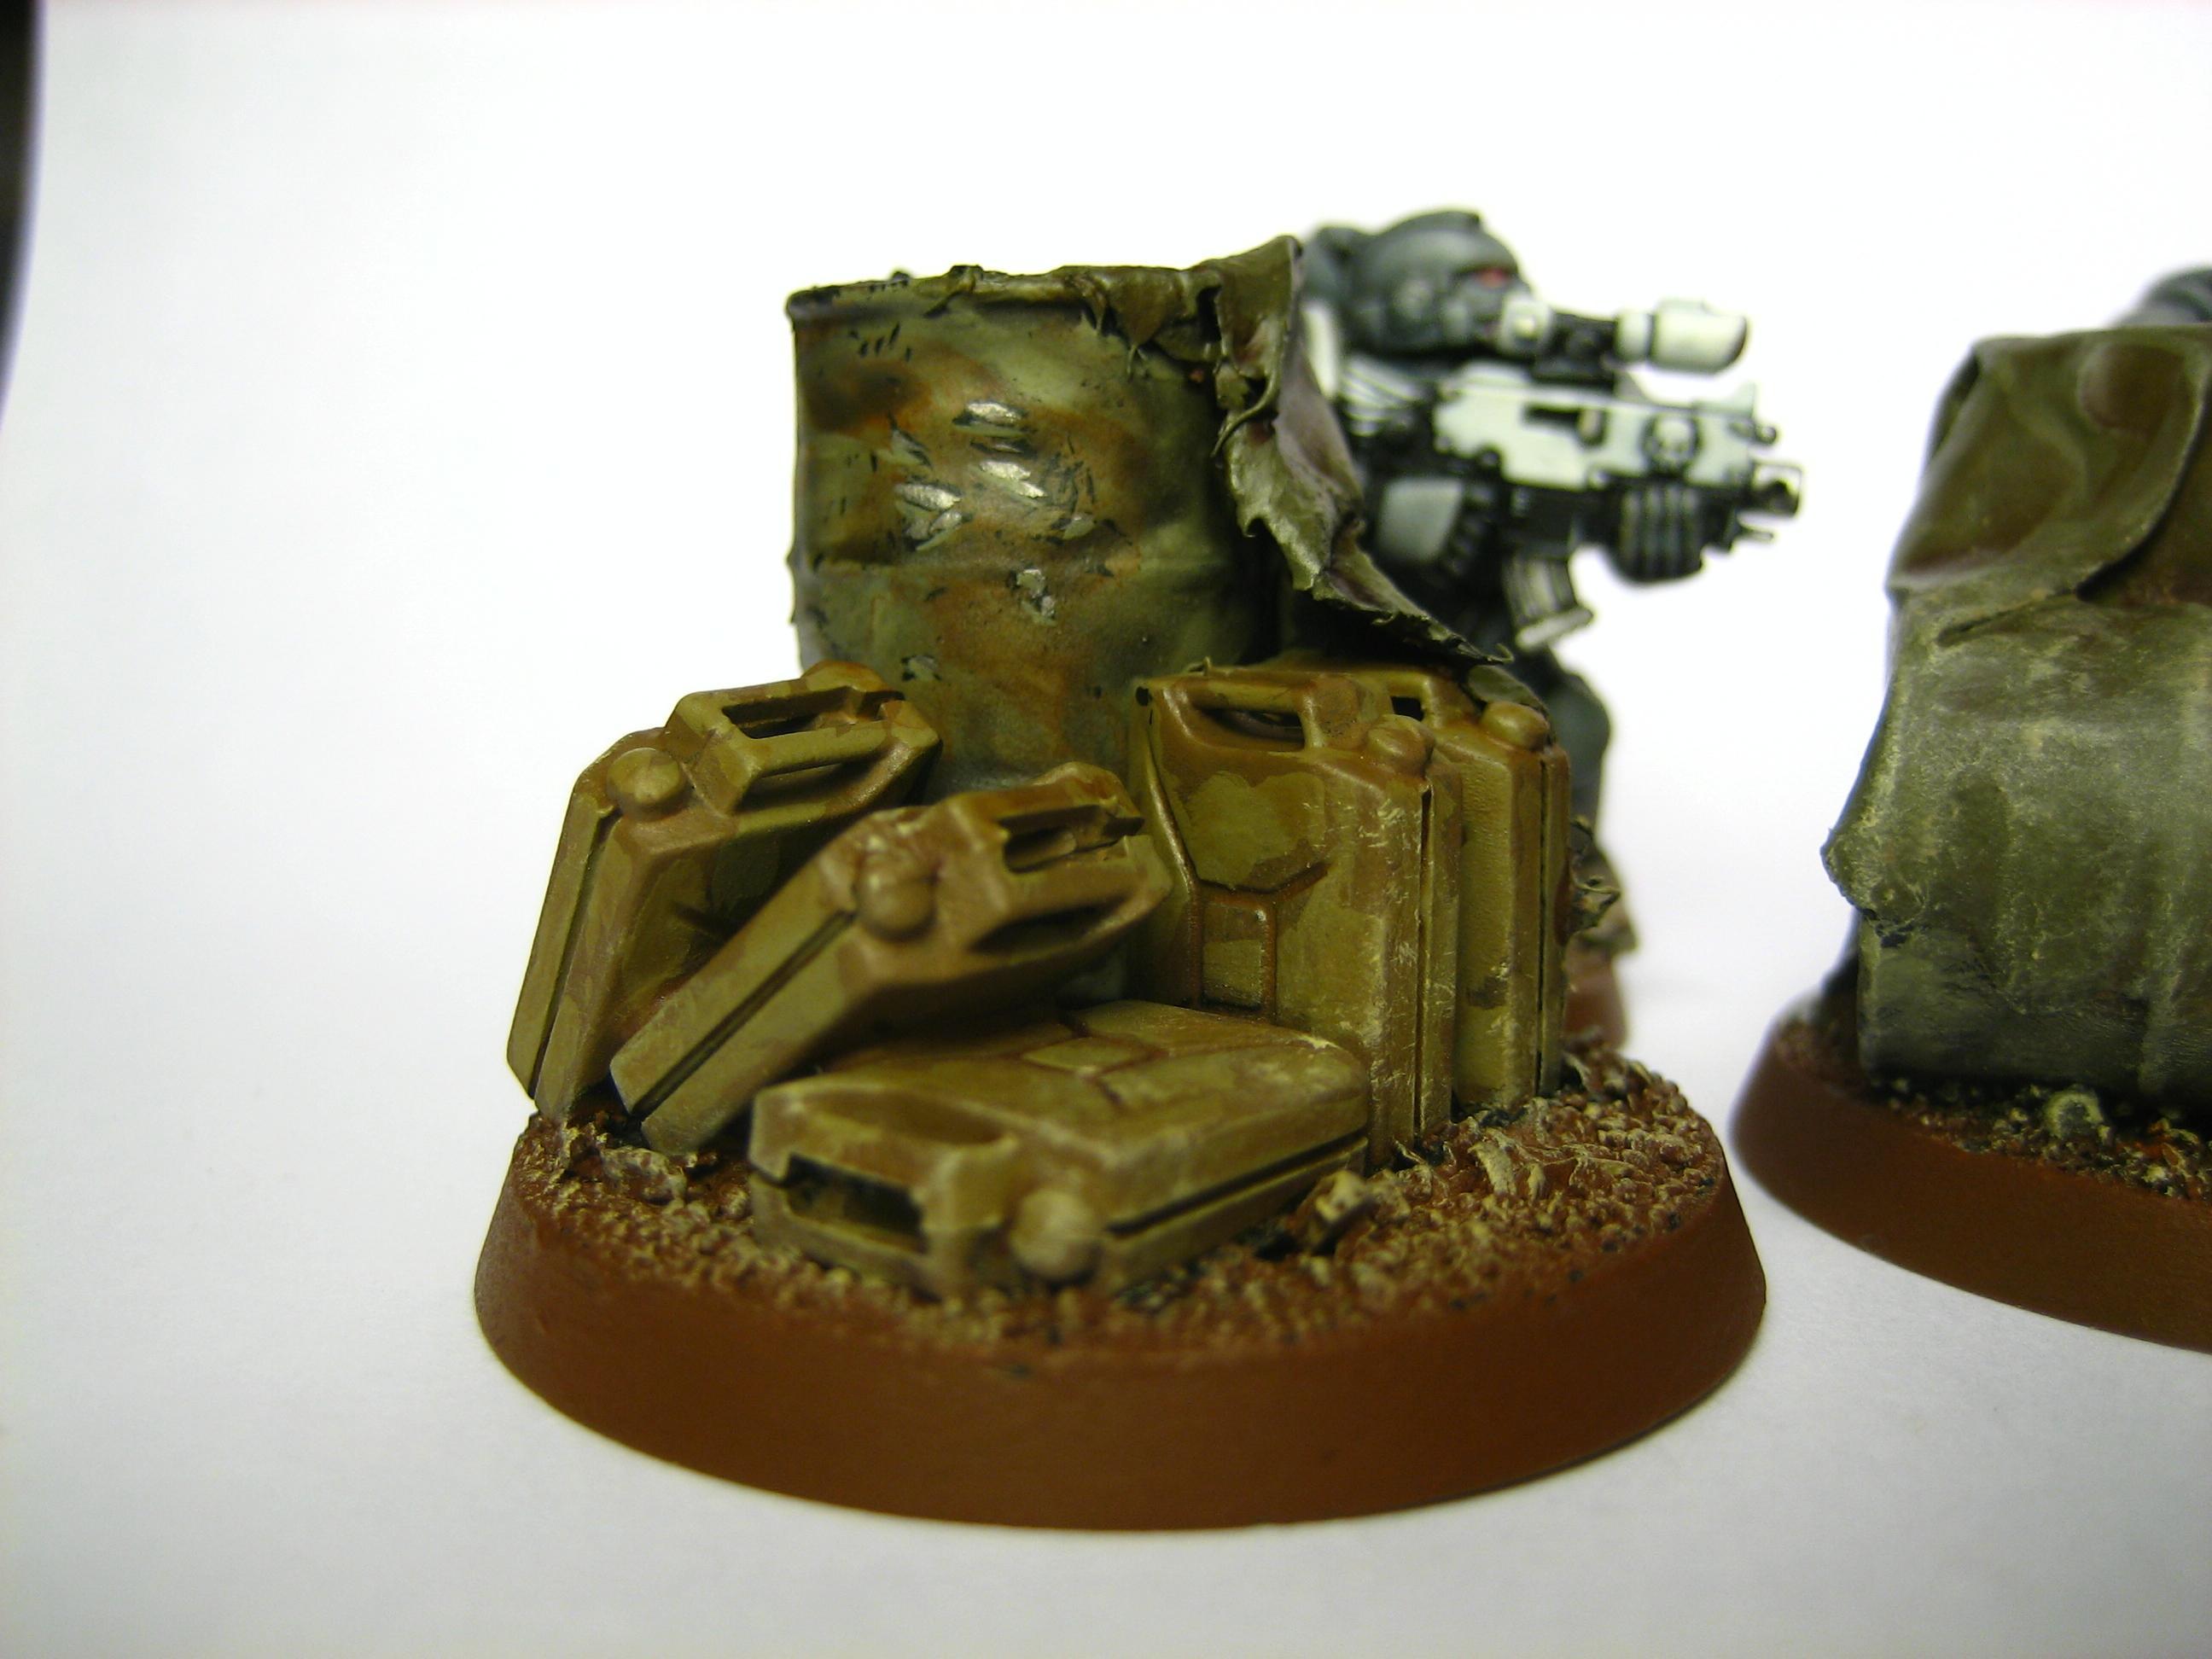 Ammo, Barrels, Objective Marker, Warhammer 40,000